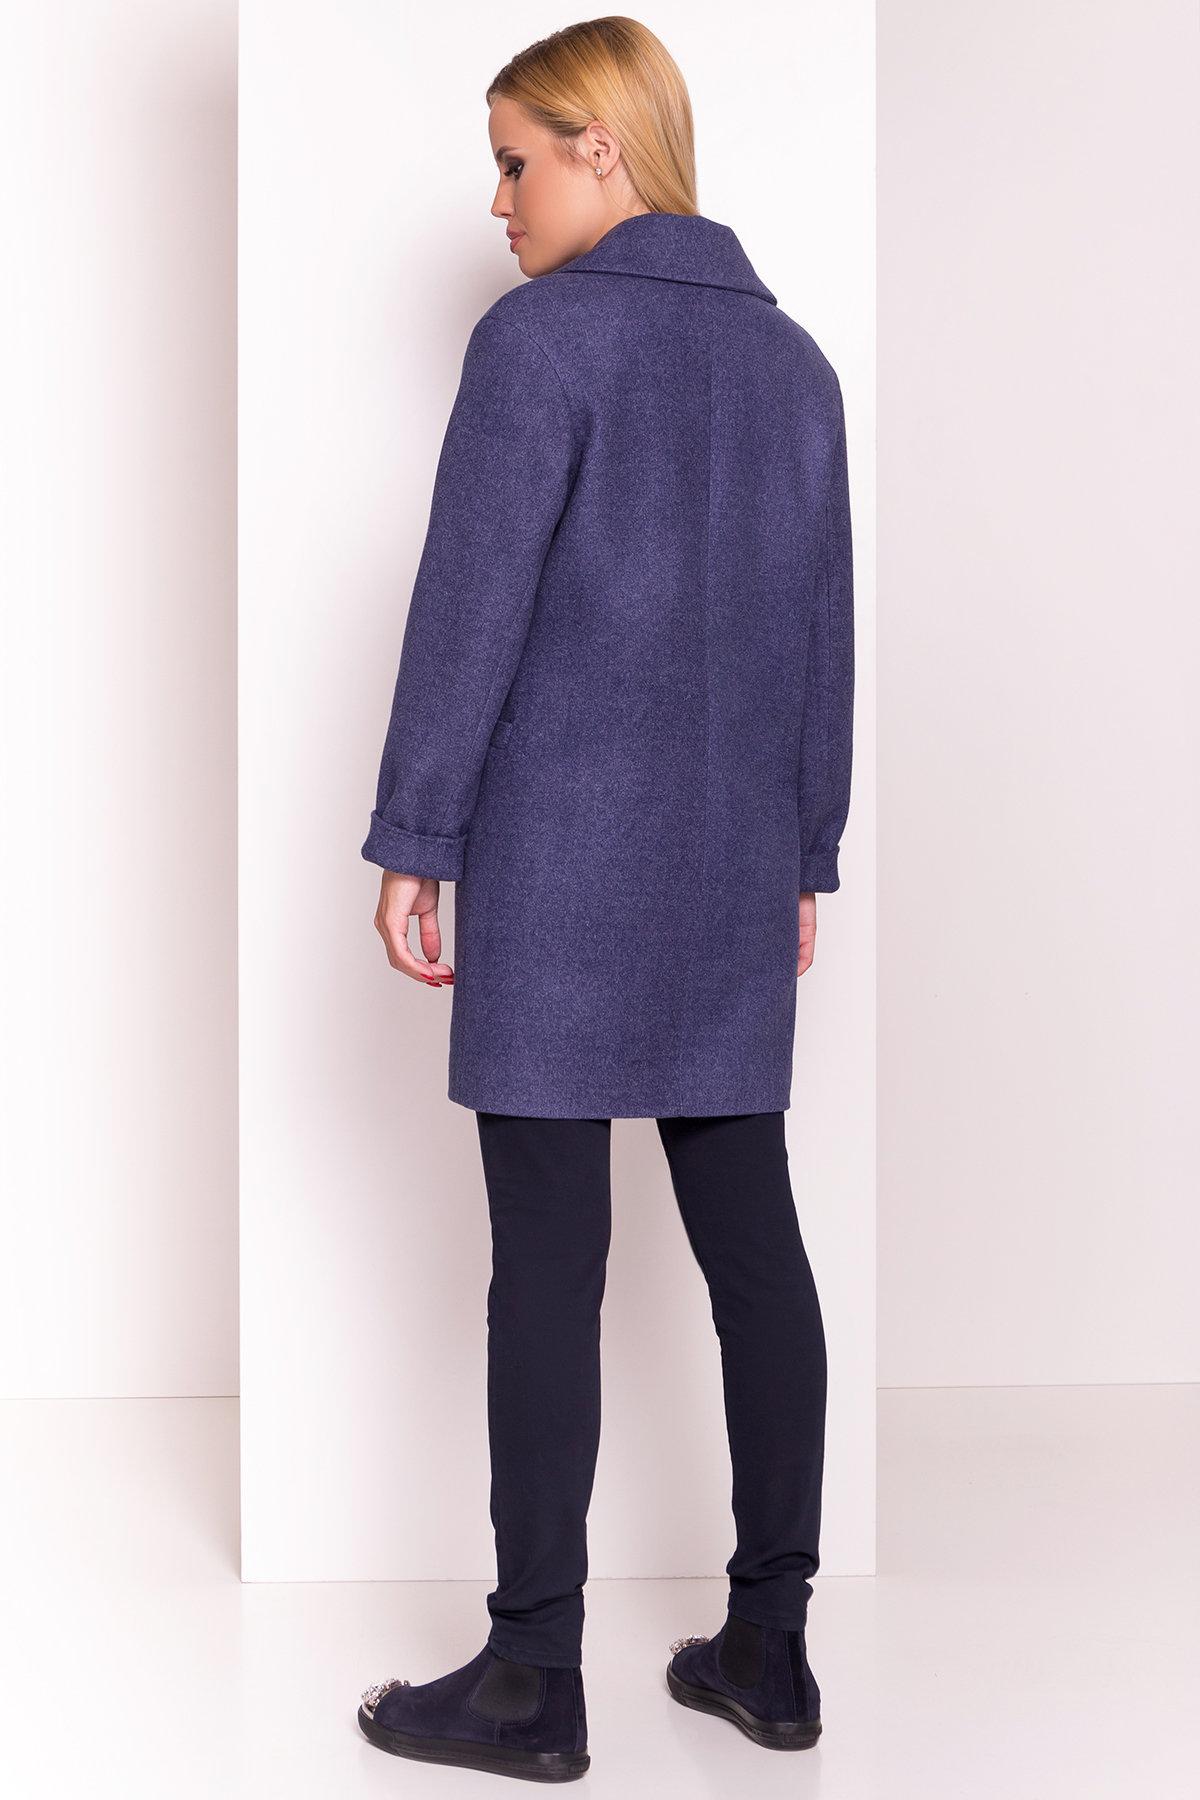 Пальто Вива 4558 АРТ. 37263 Цвет: Джинс - фото 4, интернет магазин tm-modus.ru